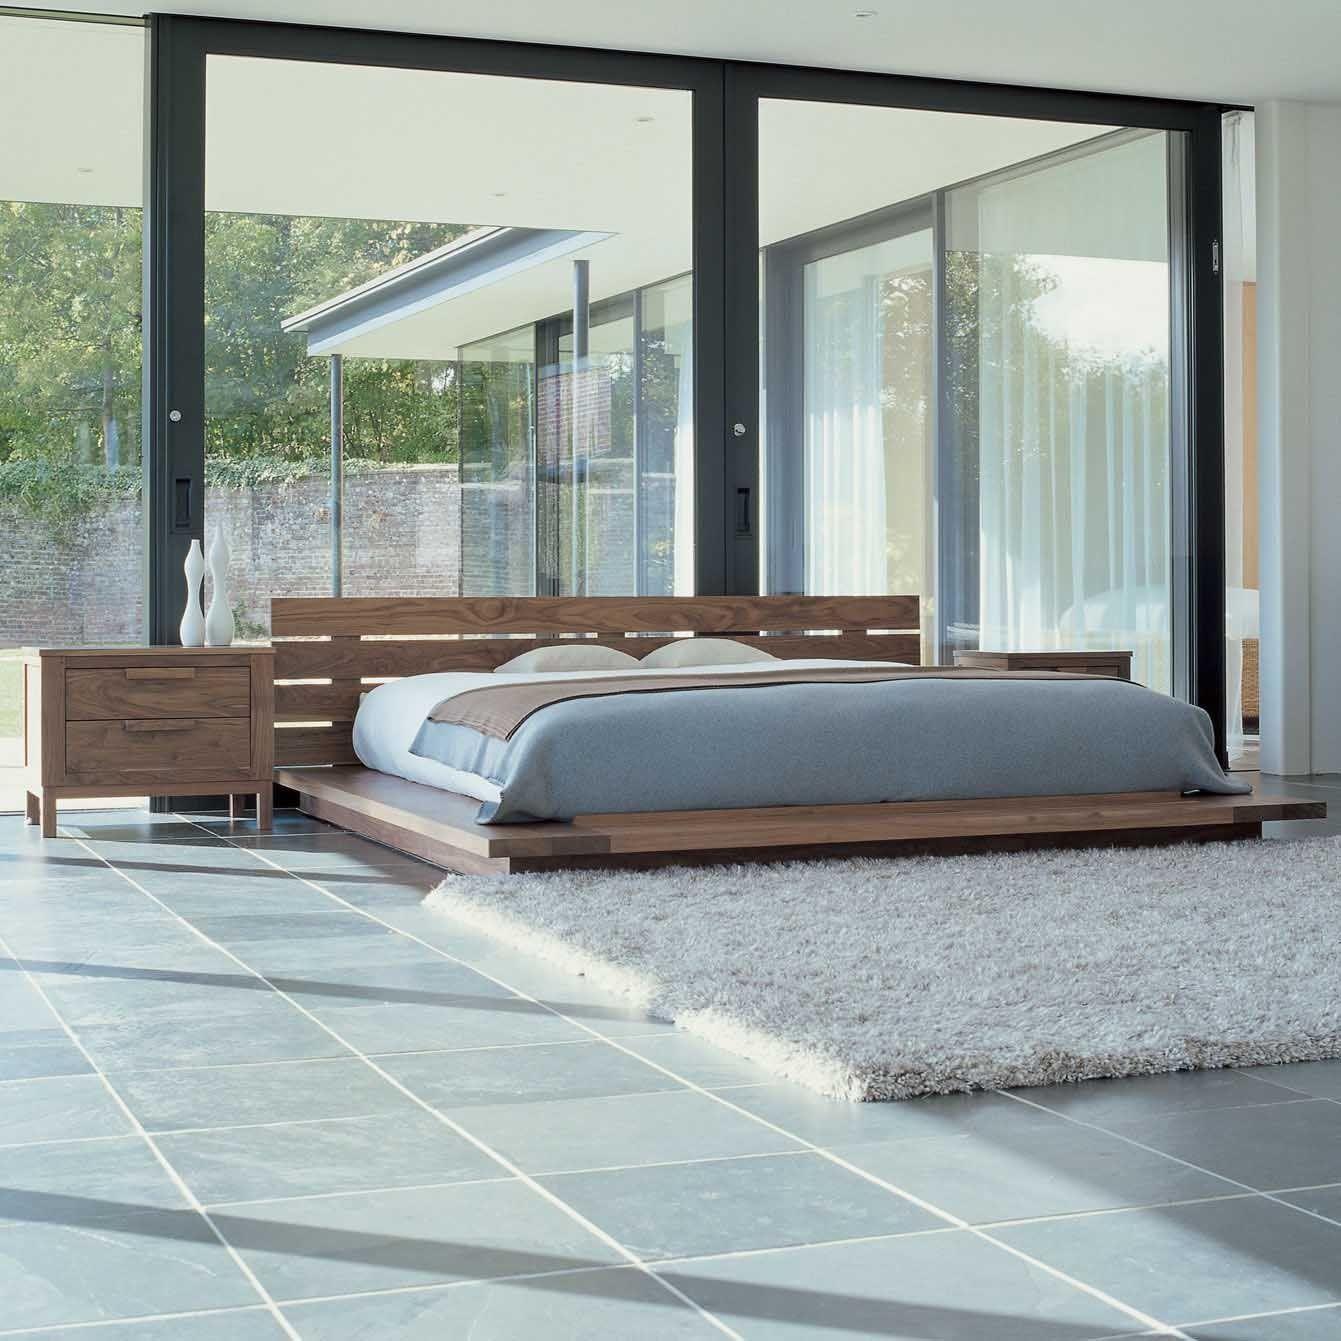 die besten 25 zen bed ideen auf pinterest feng shui dekoration feng shui und feng shui. Black Bedroom Furniture Sets. Home Design Ideas